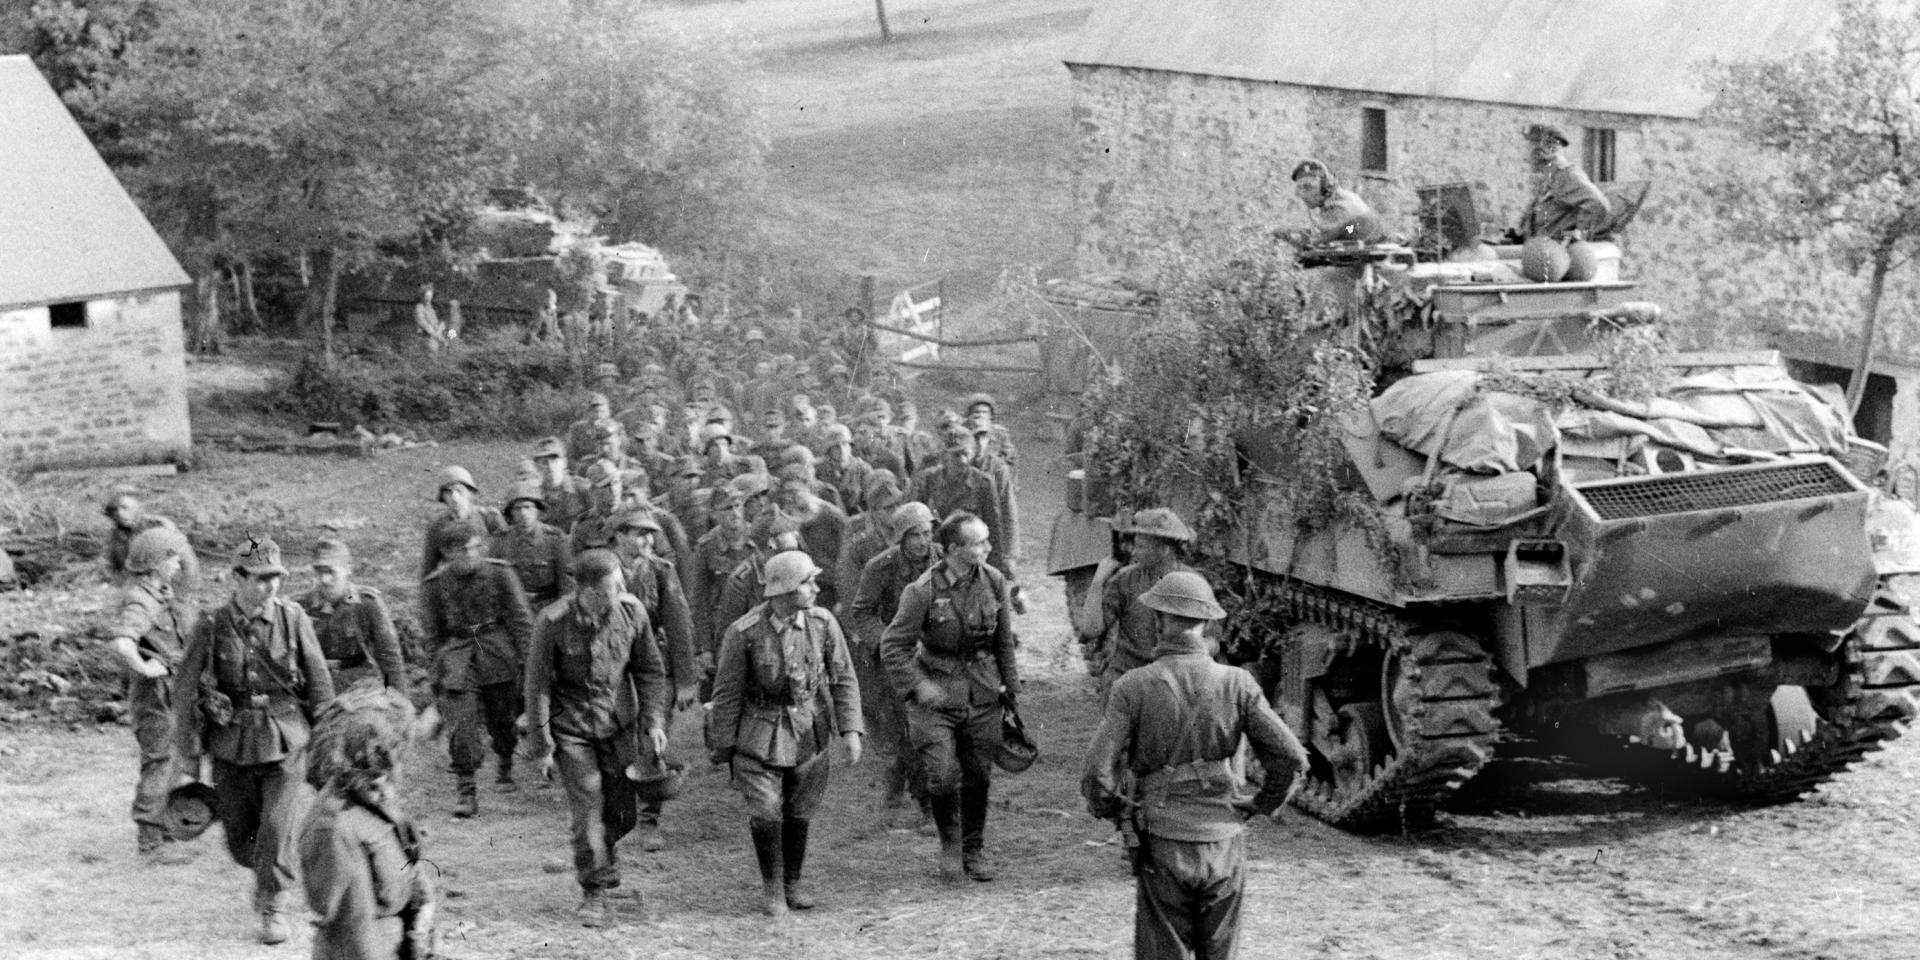 Captured German prisoners near Falaise, 1944